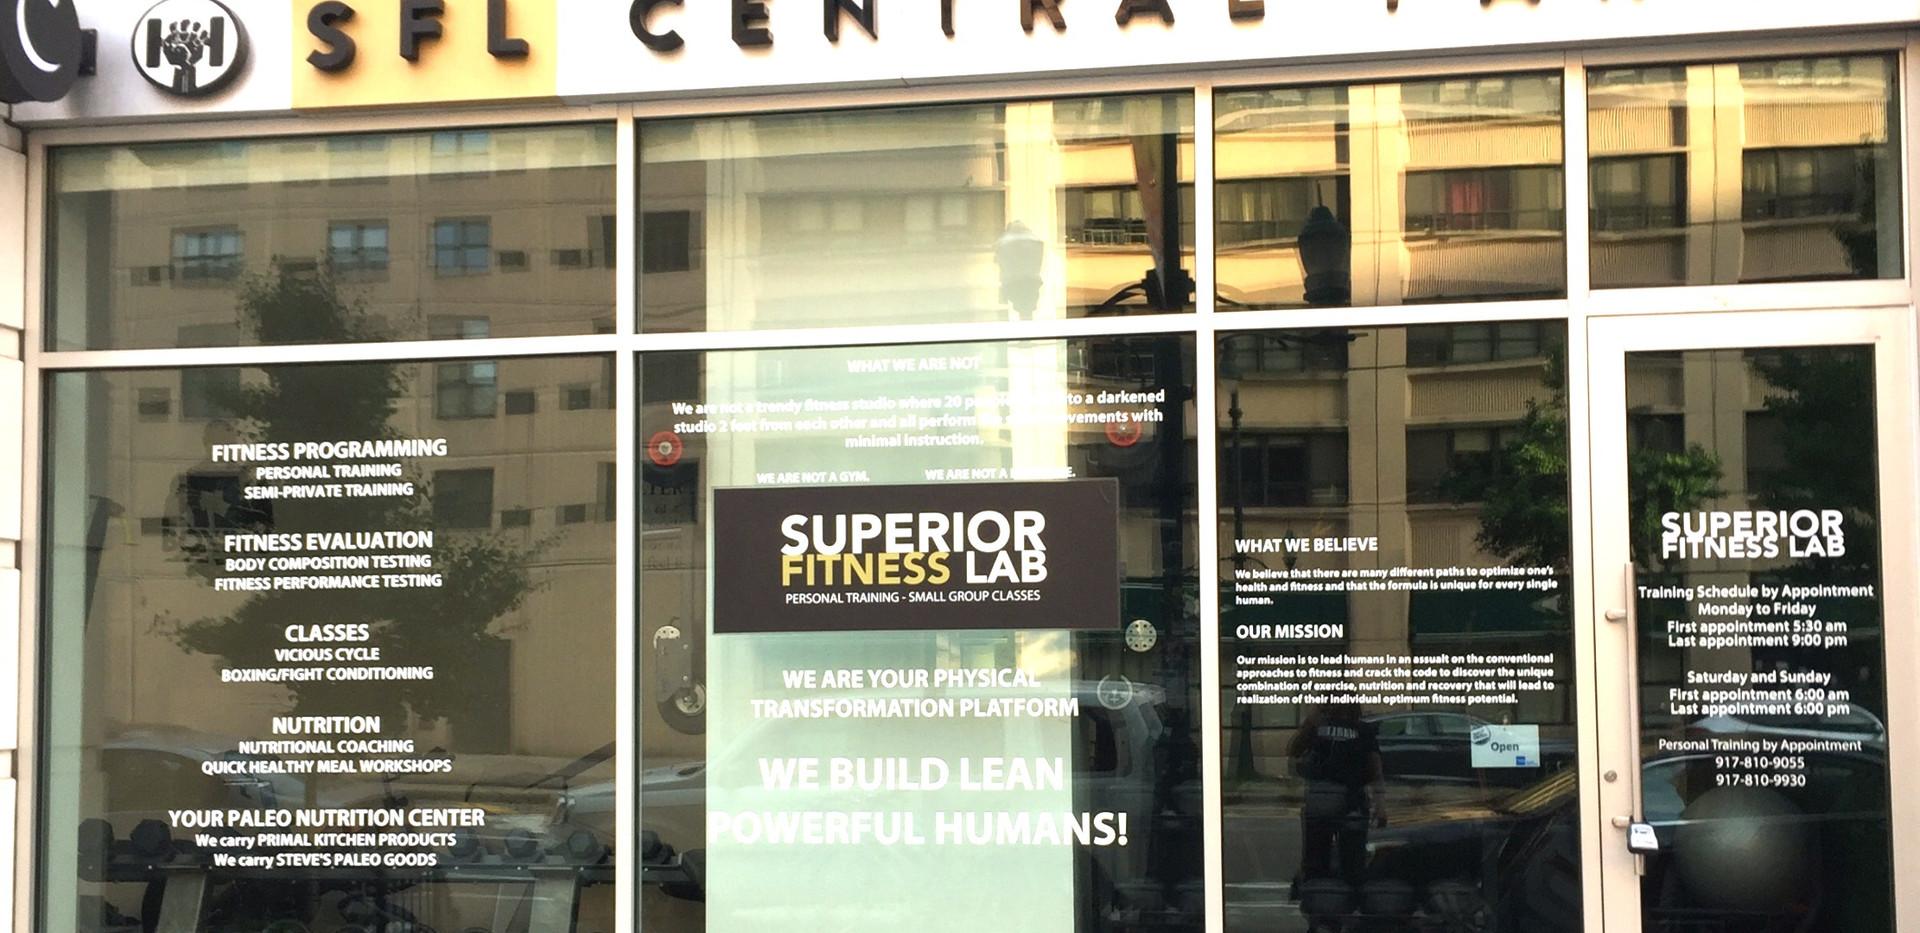 360 Degree Hybrid Training Location